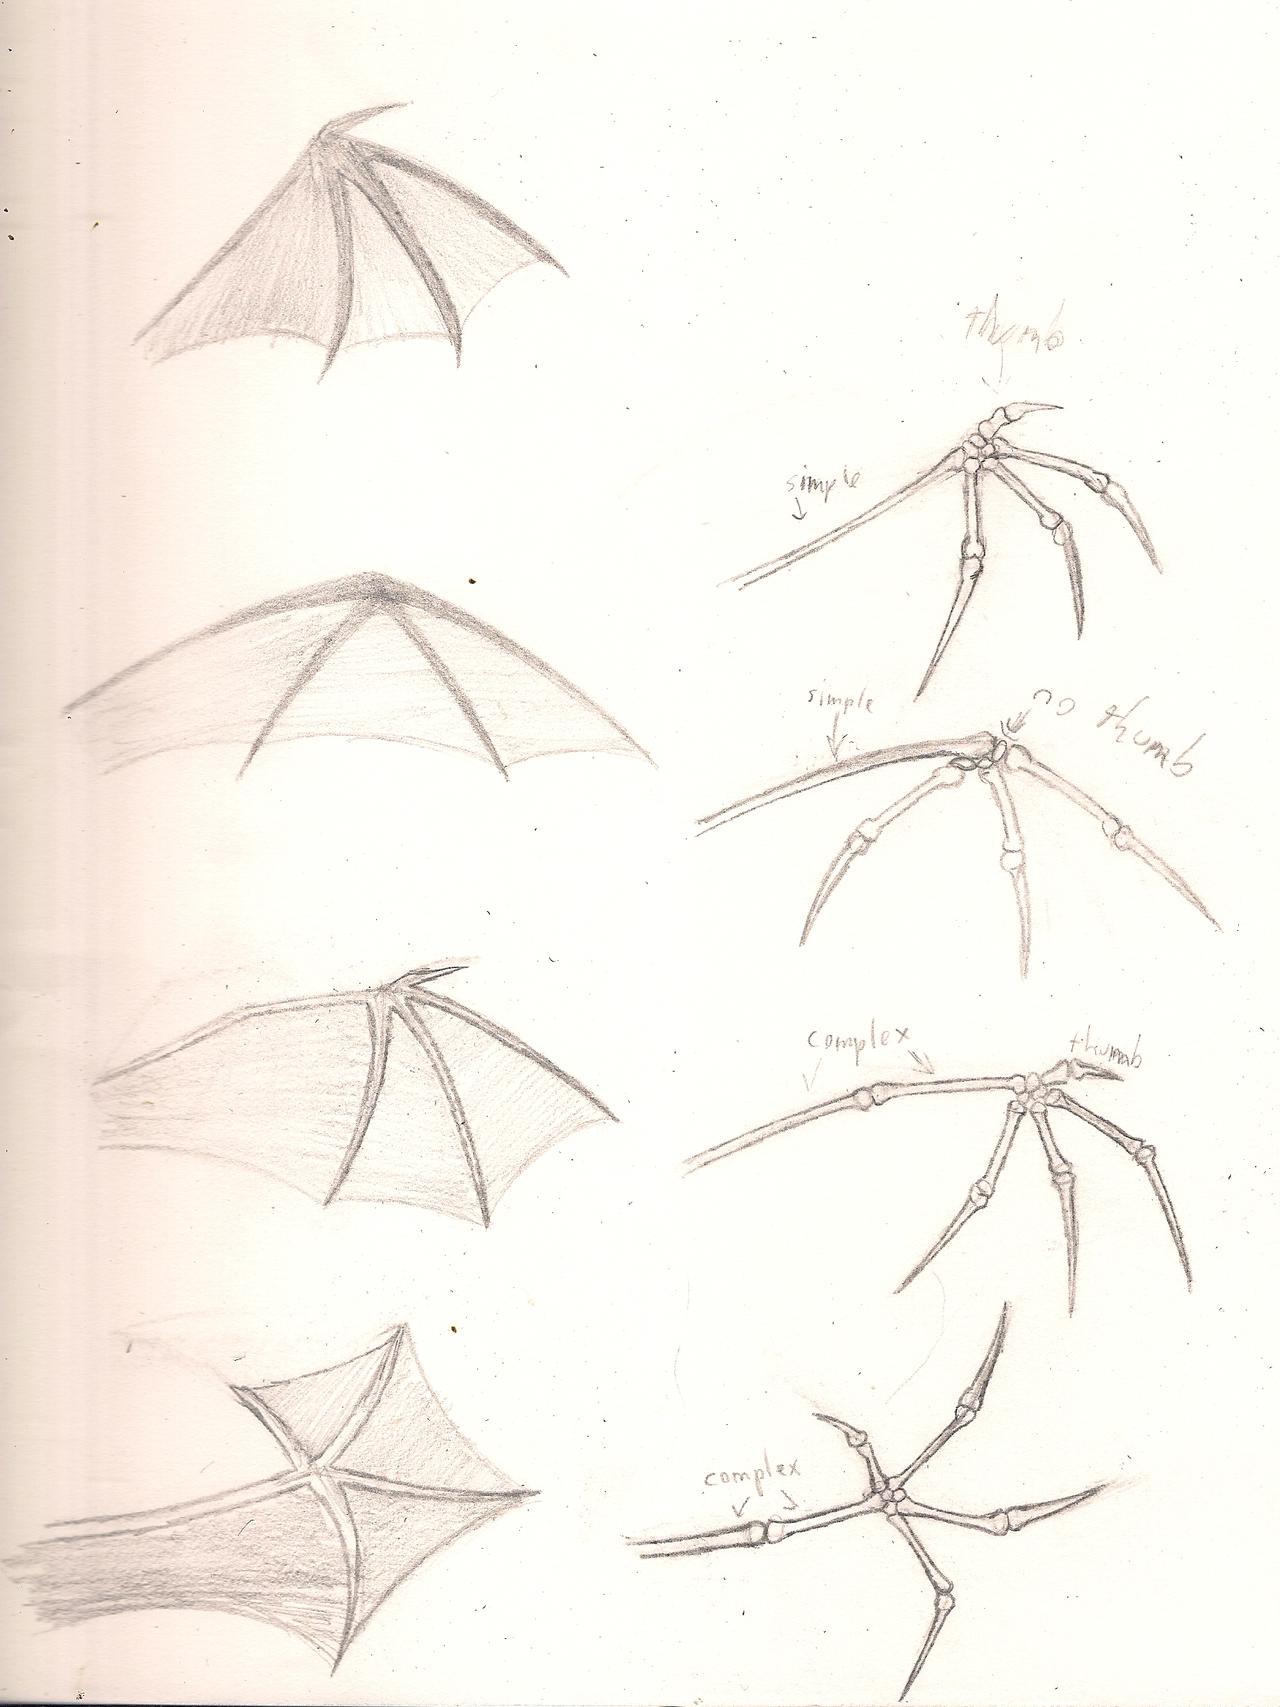 dragon wing anatomy - Google Search | Draw & Paint | Pinterest ...